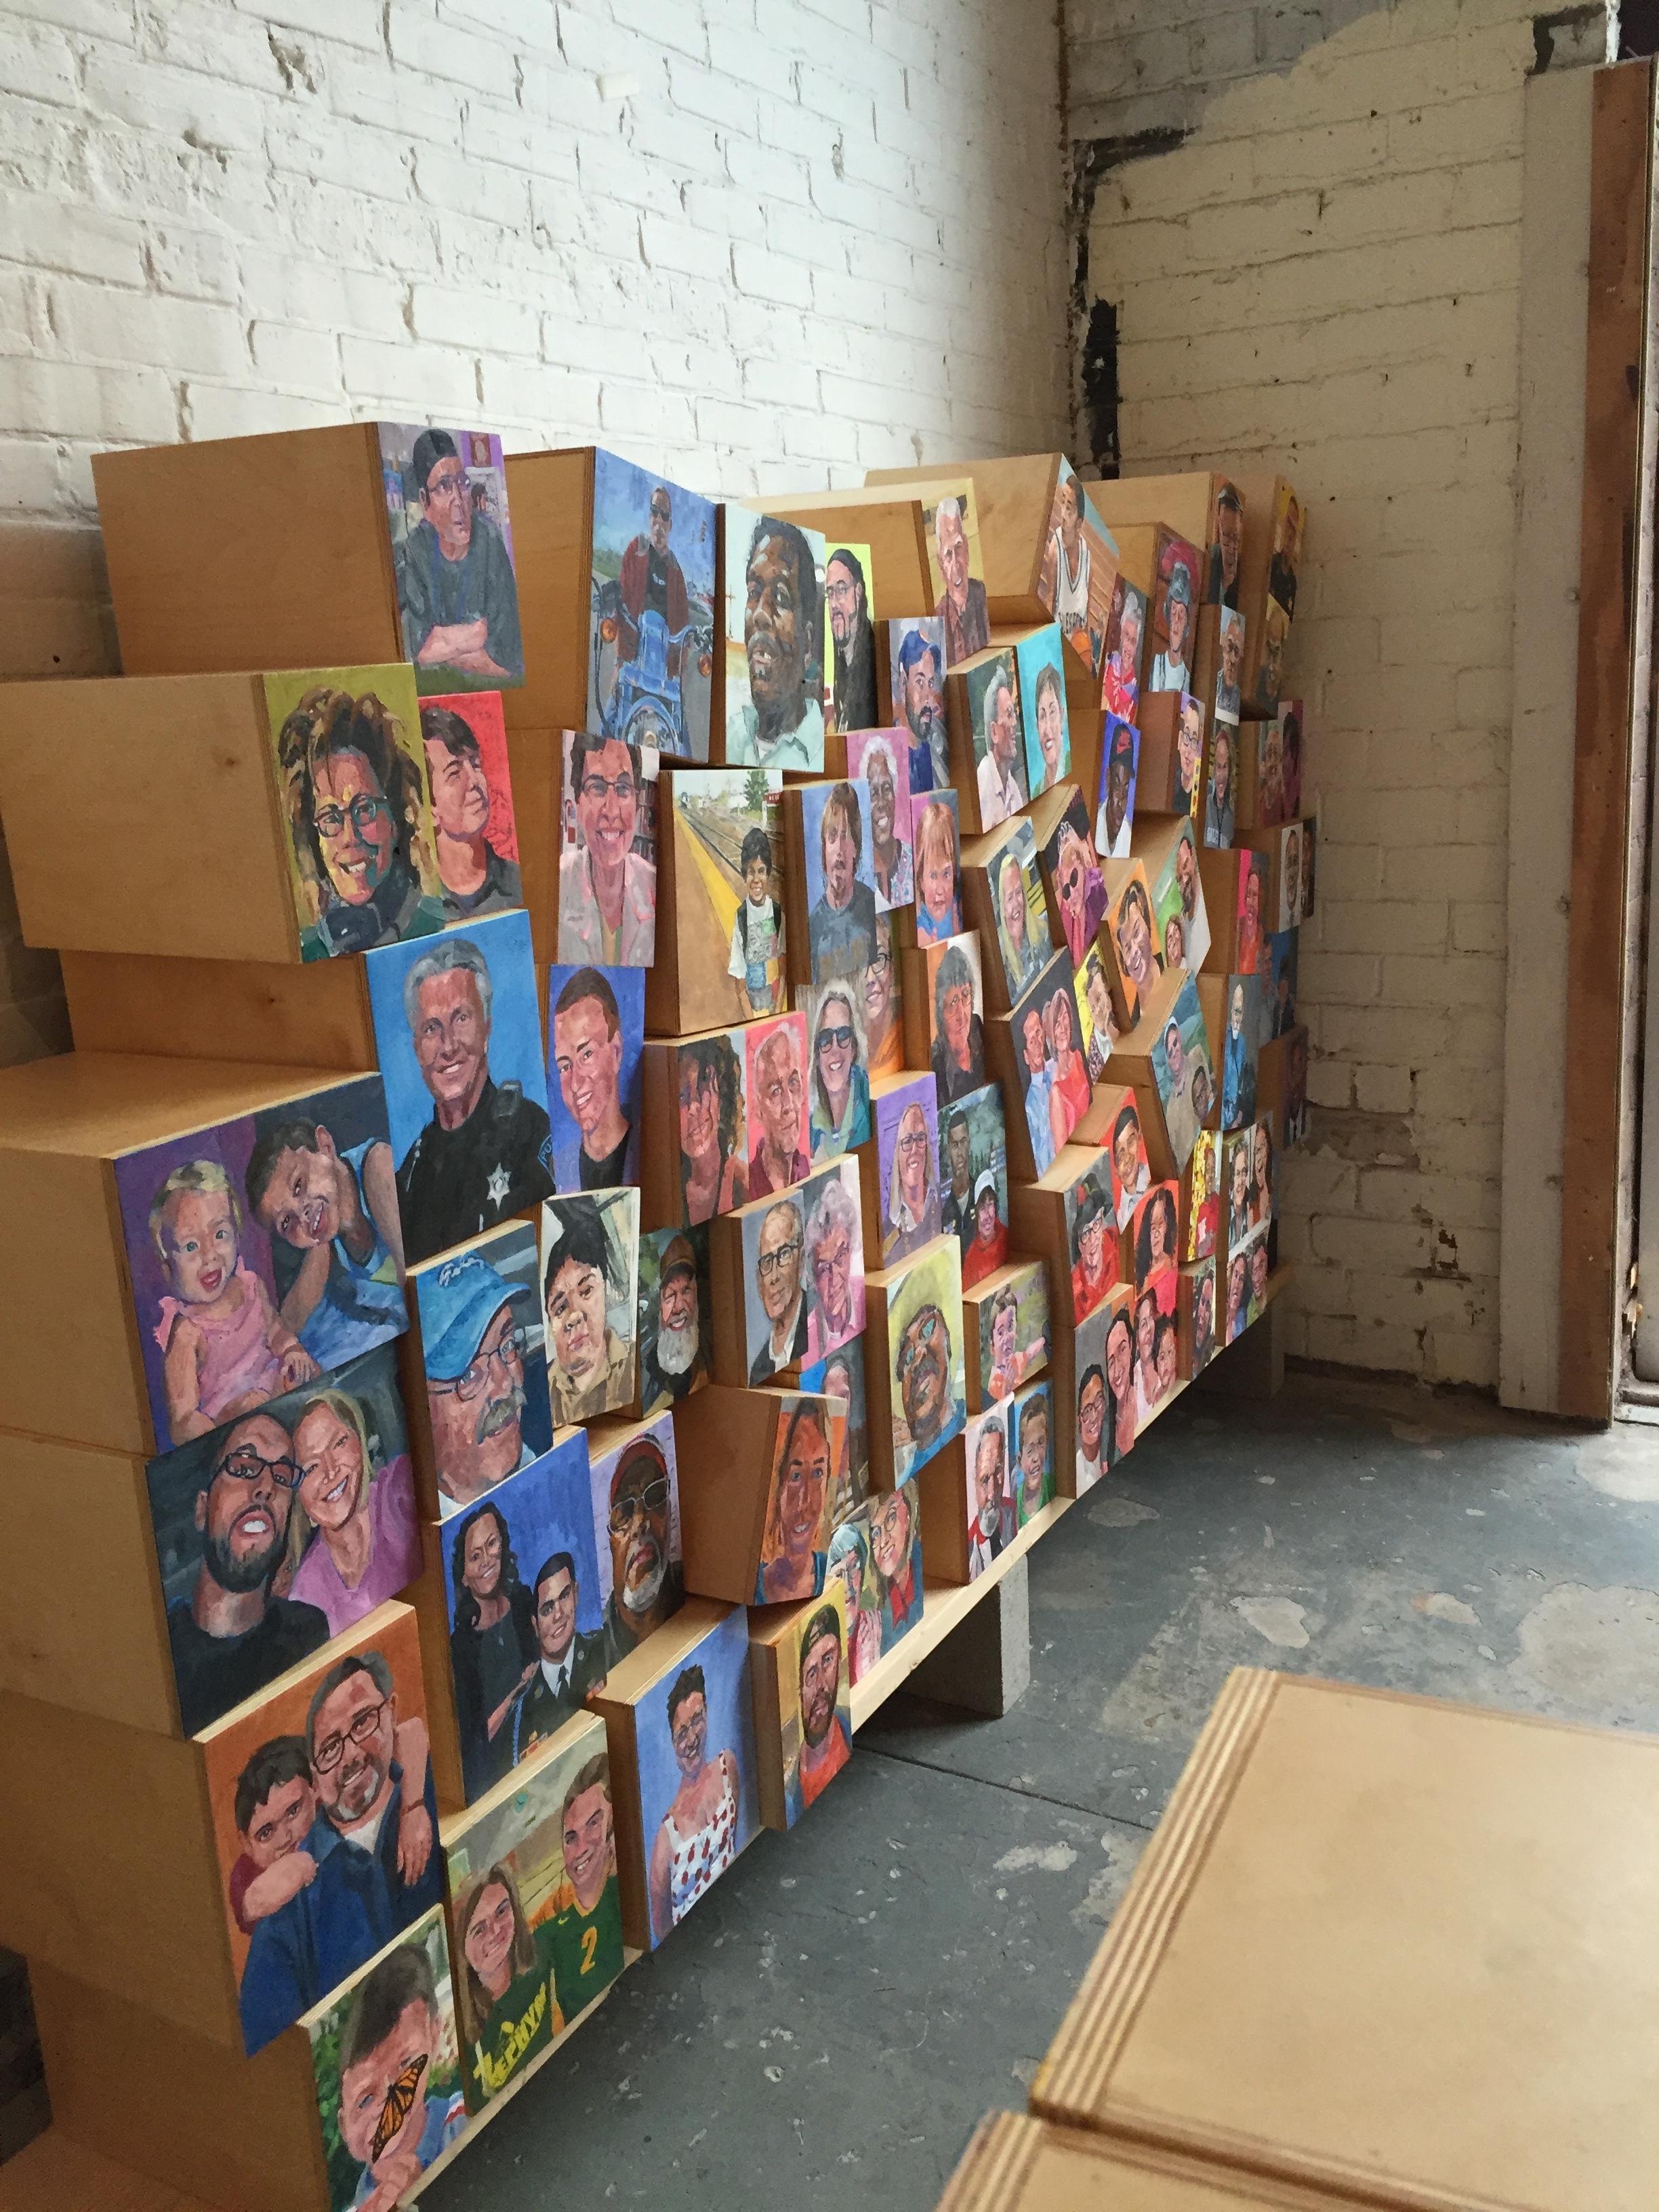 The in-progress installation at the box, Kellogg at Simmons.